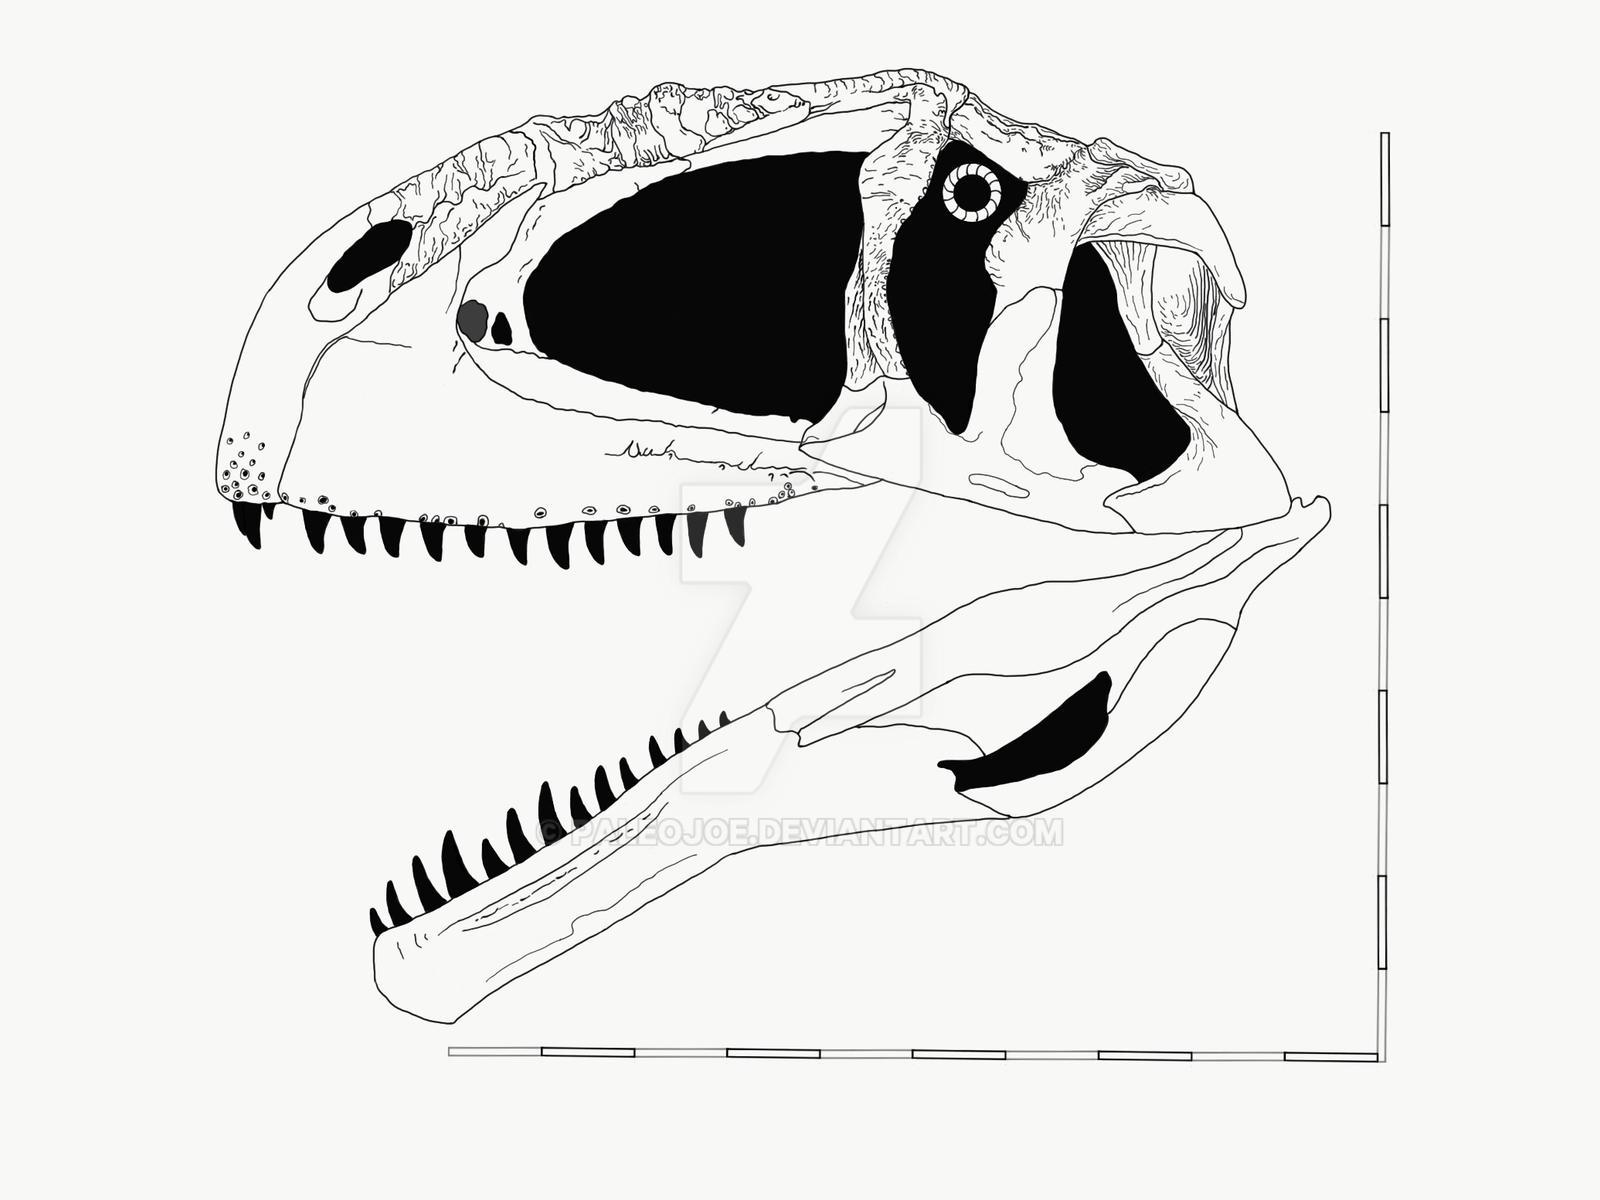 Mapusaurus sneak peek by PaleoJoe